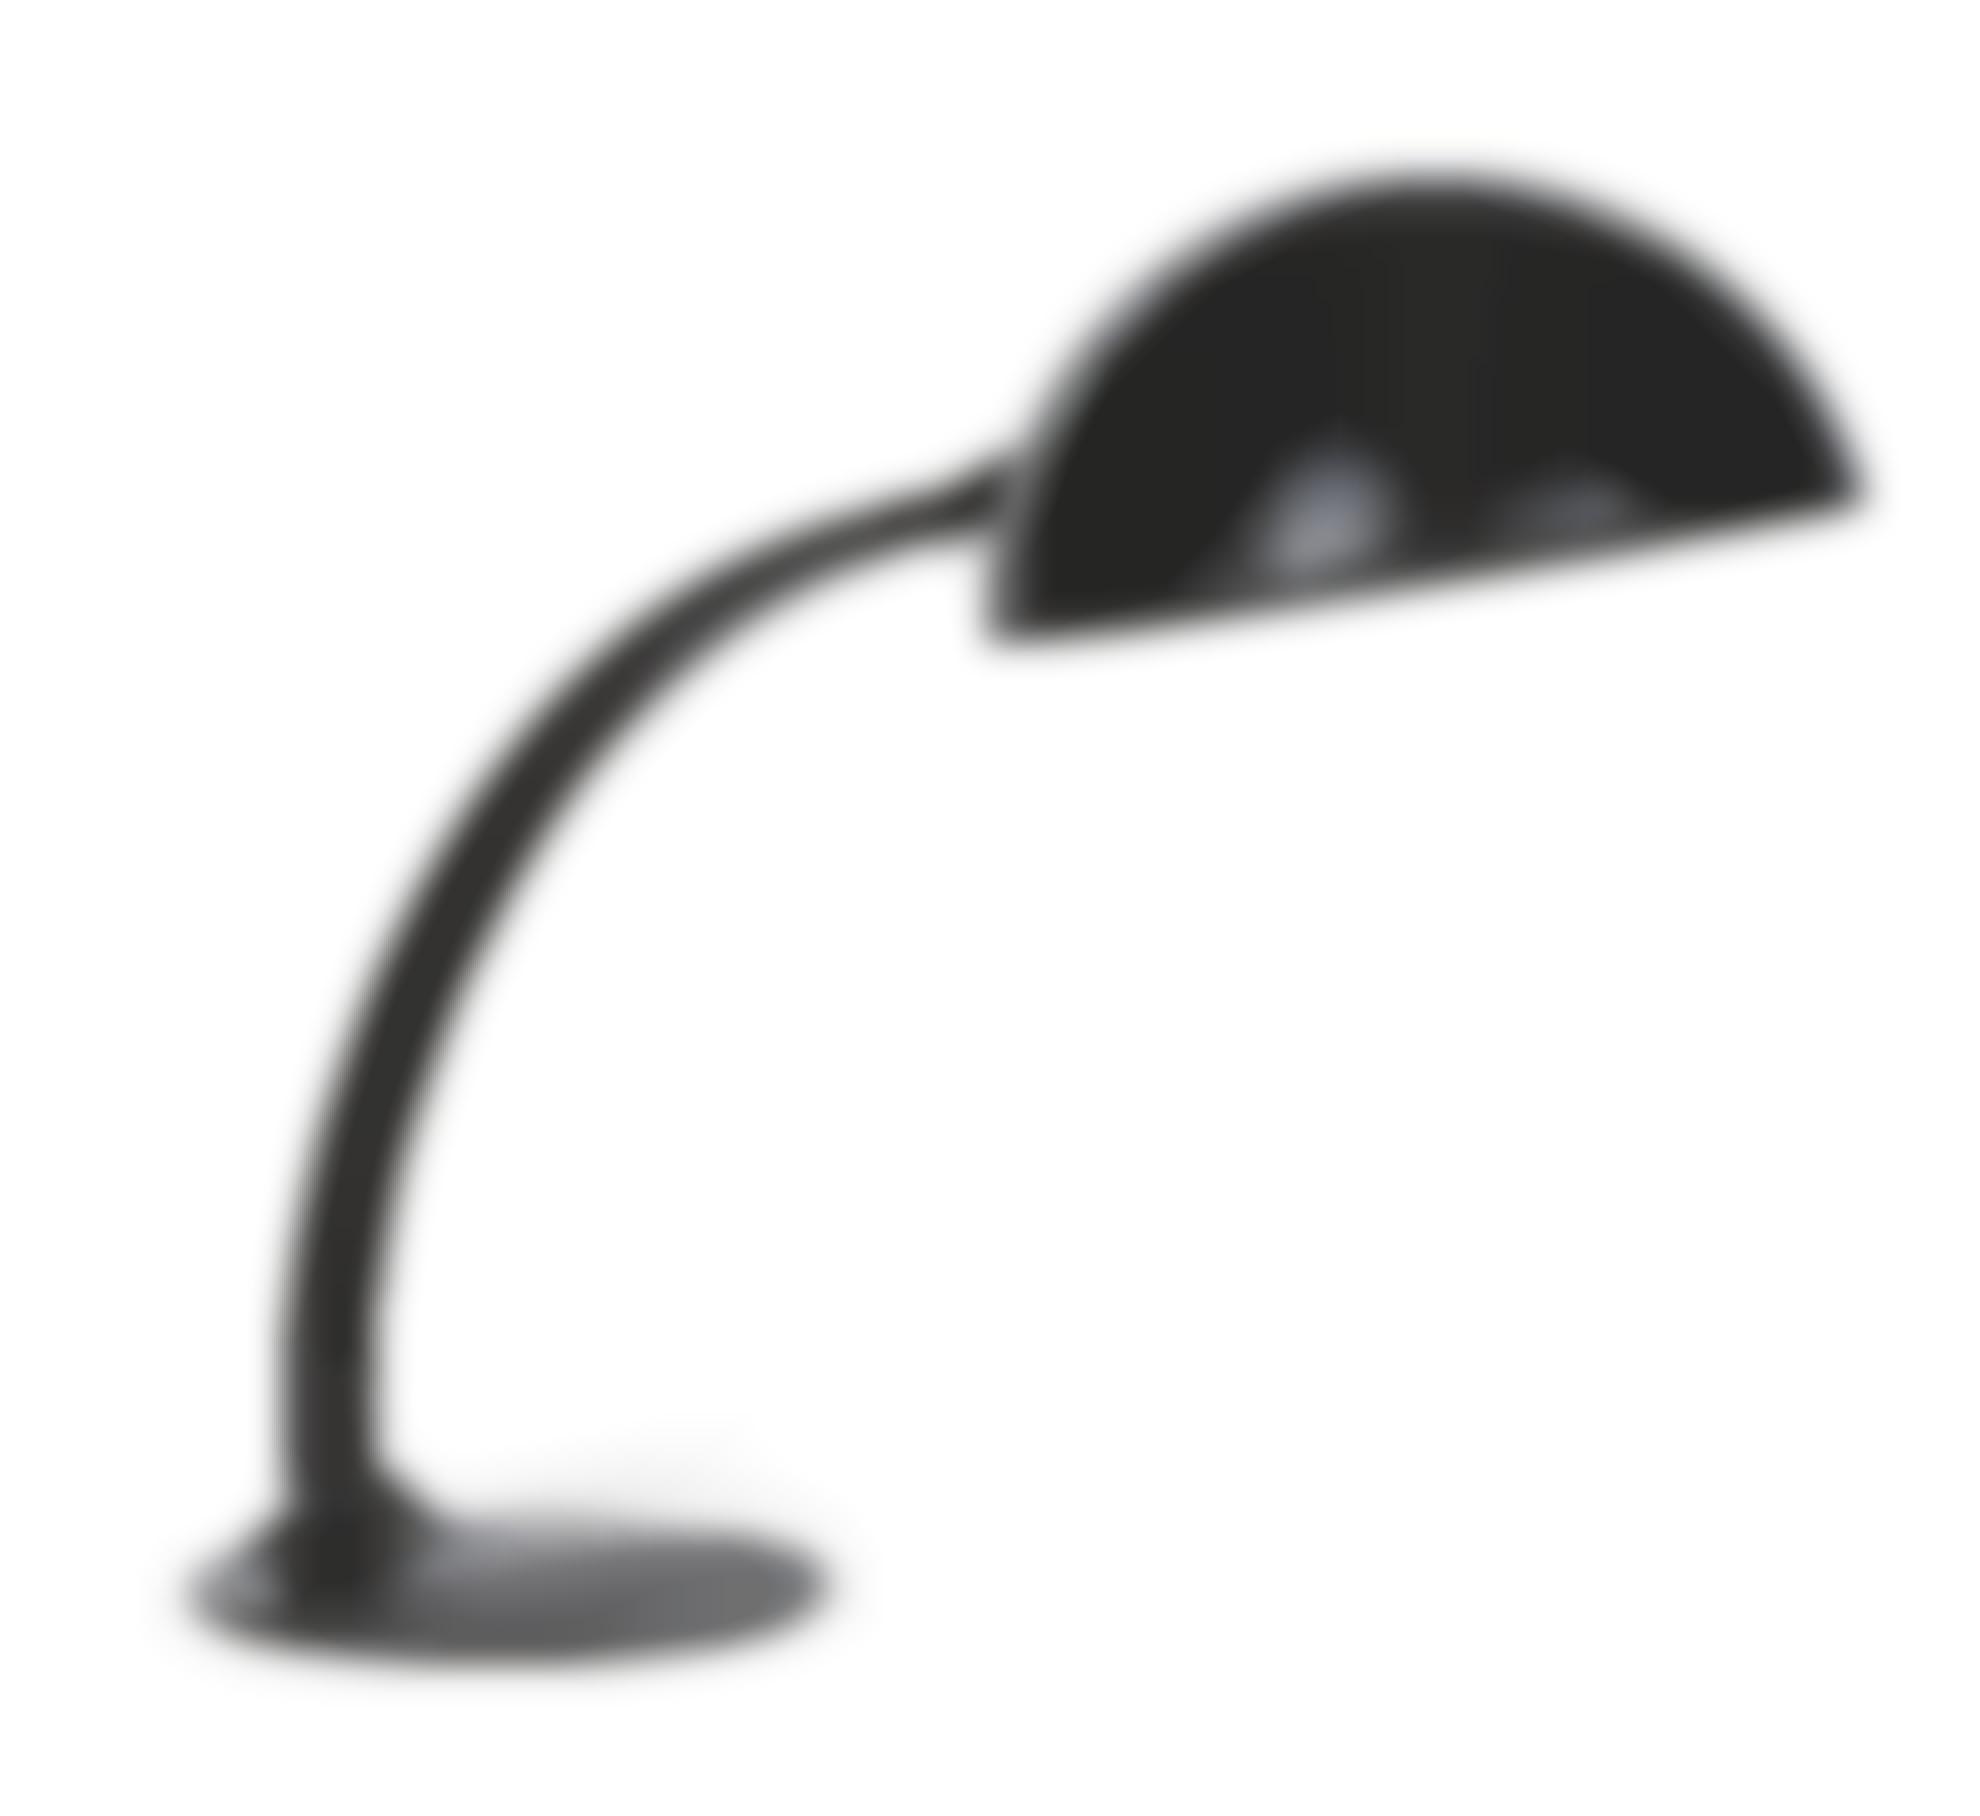 Elio Martinelli - Flex Callota Table Lamp, Model N. 660-1970